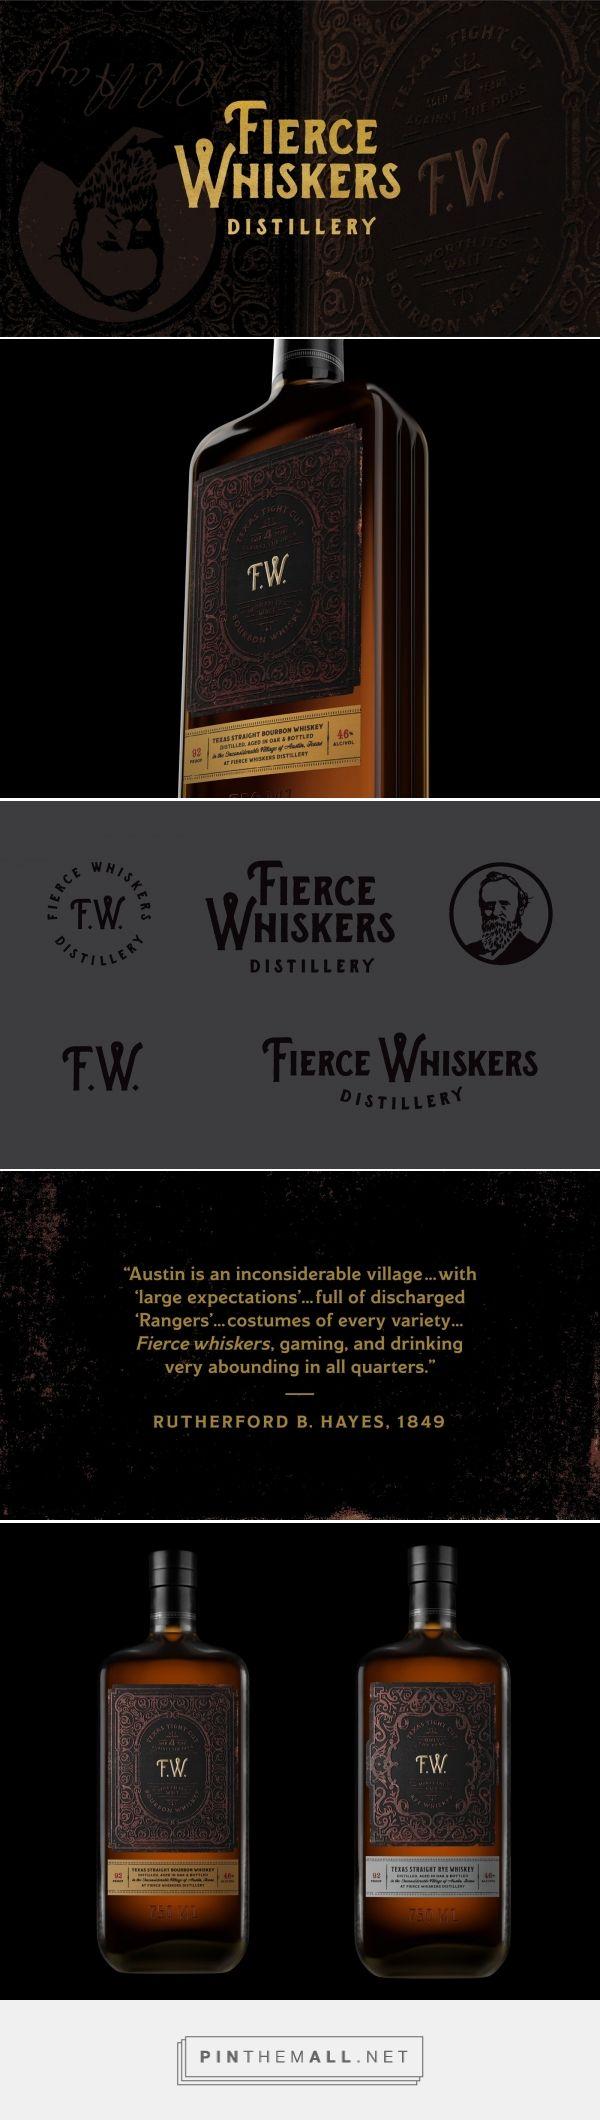 Fierce Whiskers Distillery packaging design by The Butler Bros - https://www.packagingoftheworld.com/2018/02/fierce-whiskers-distillery.html